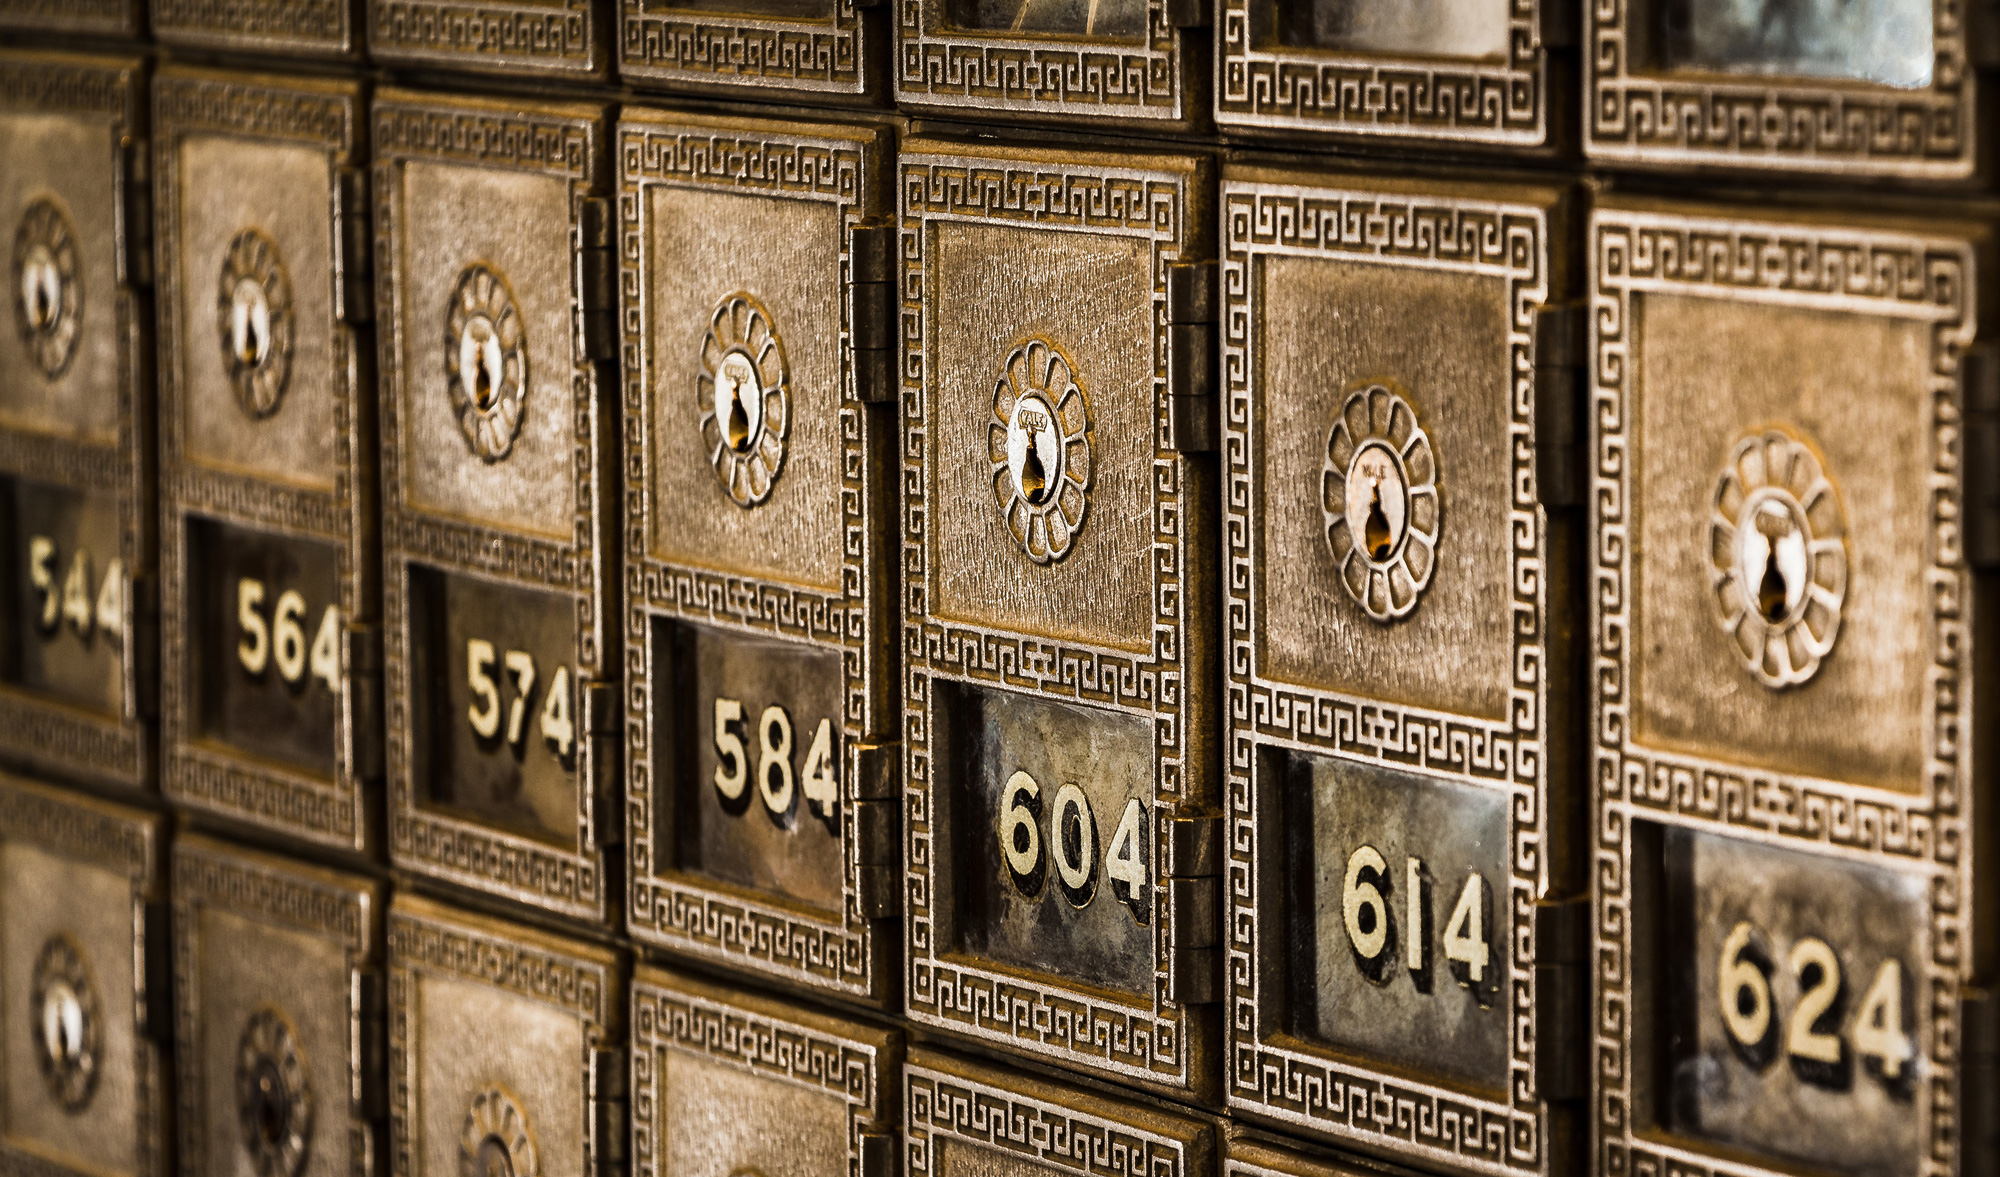 Deposito in het buitenland: ontvang meer rente op spaargeld